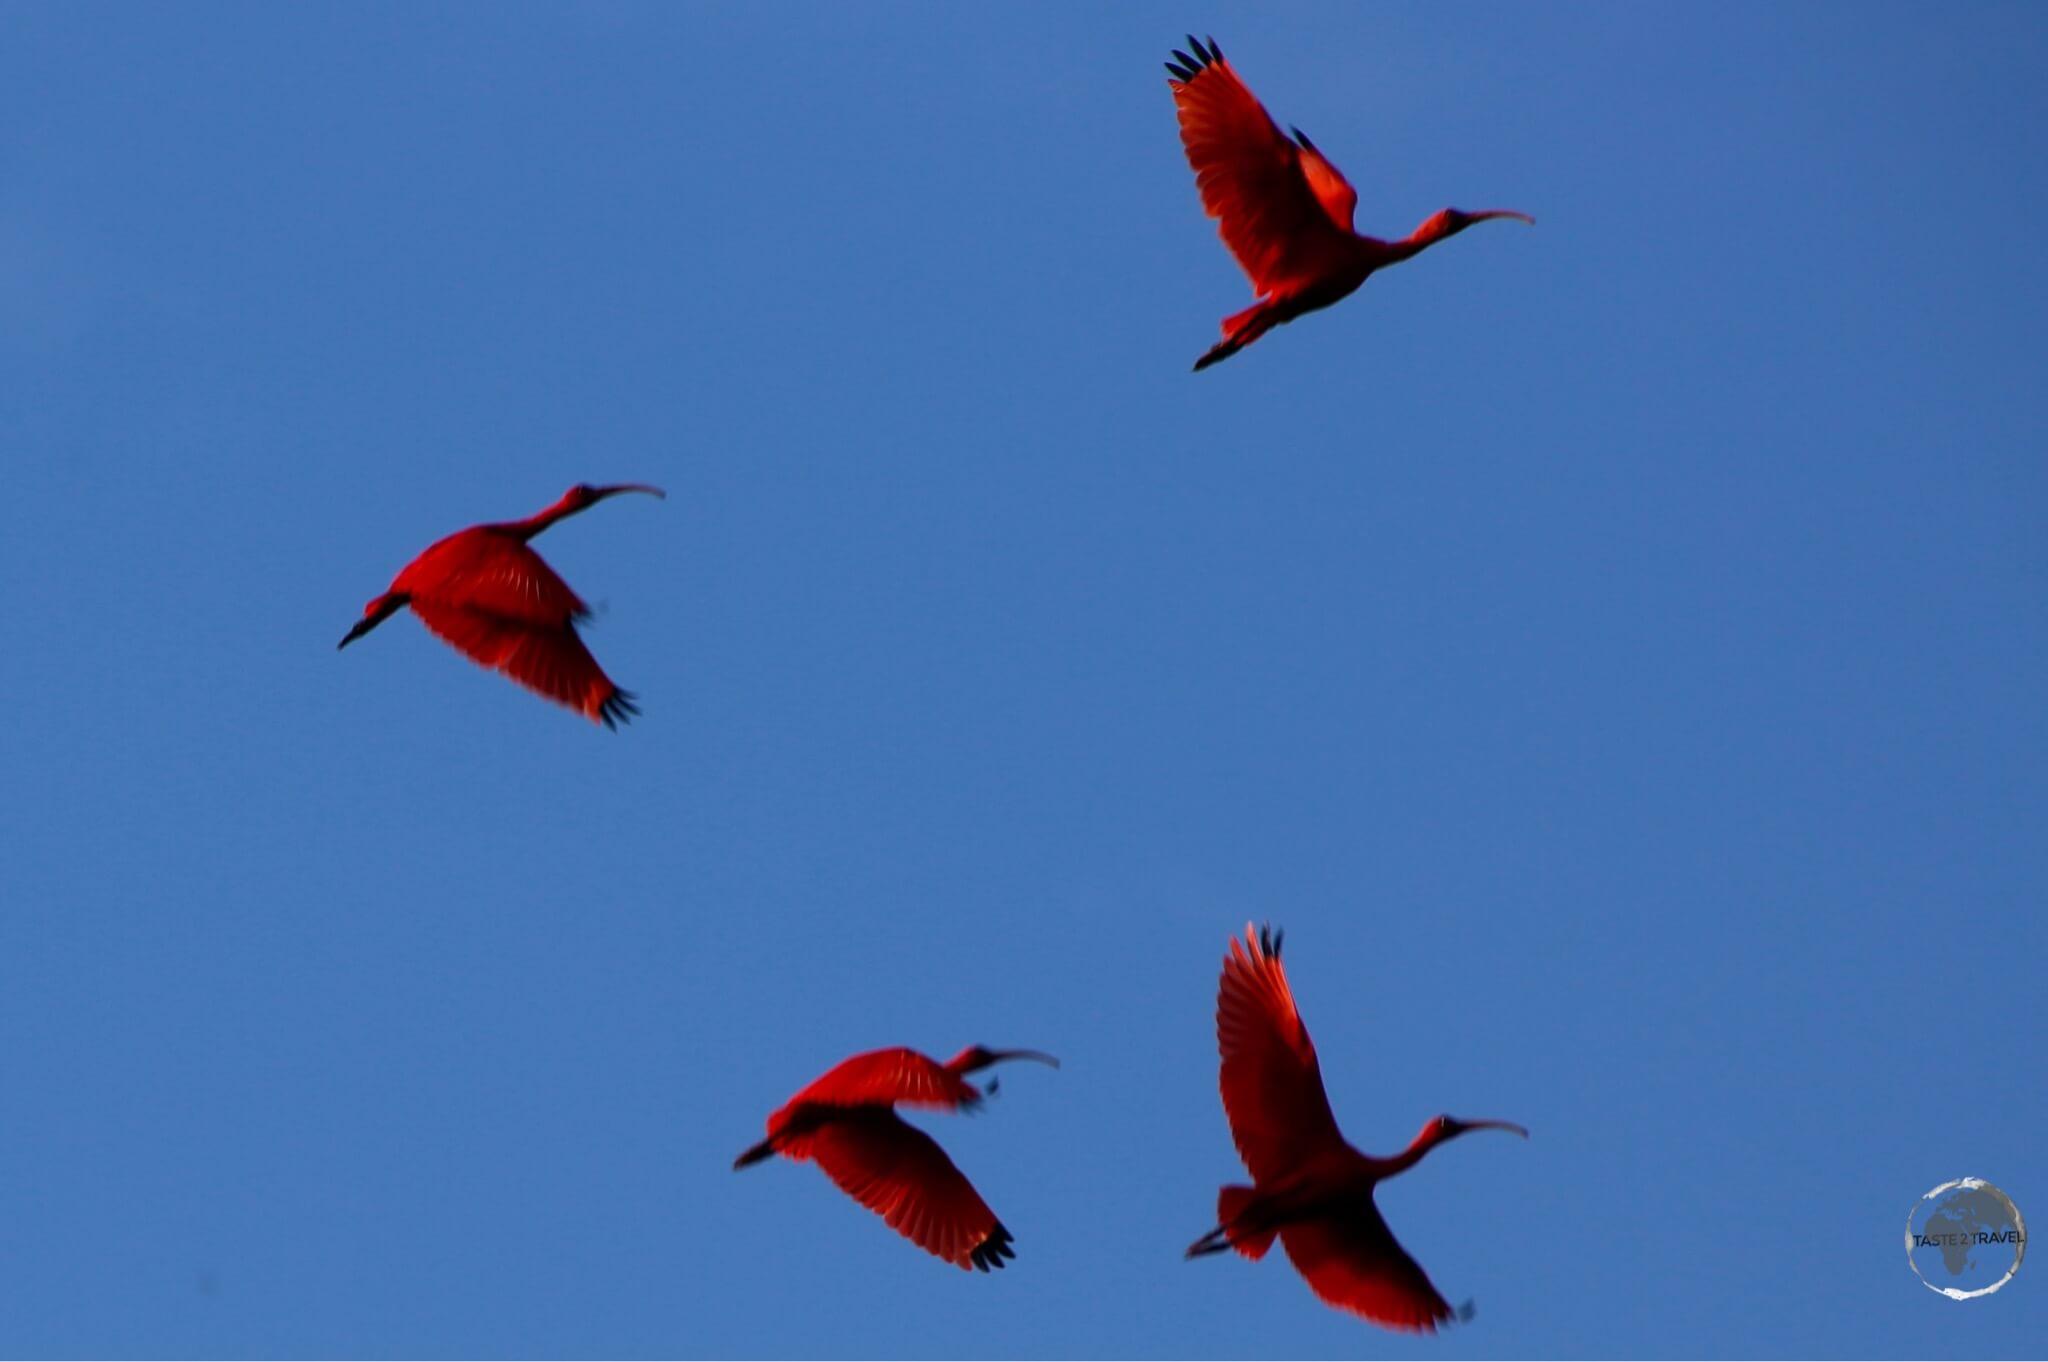 The iconic Scarlet Ibis at Caroni bird sanctuary.